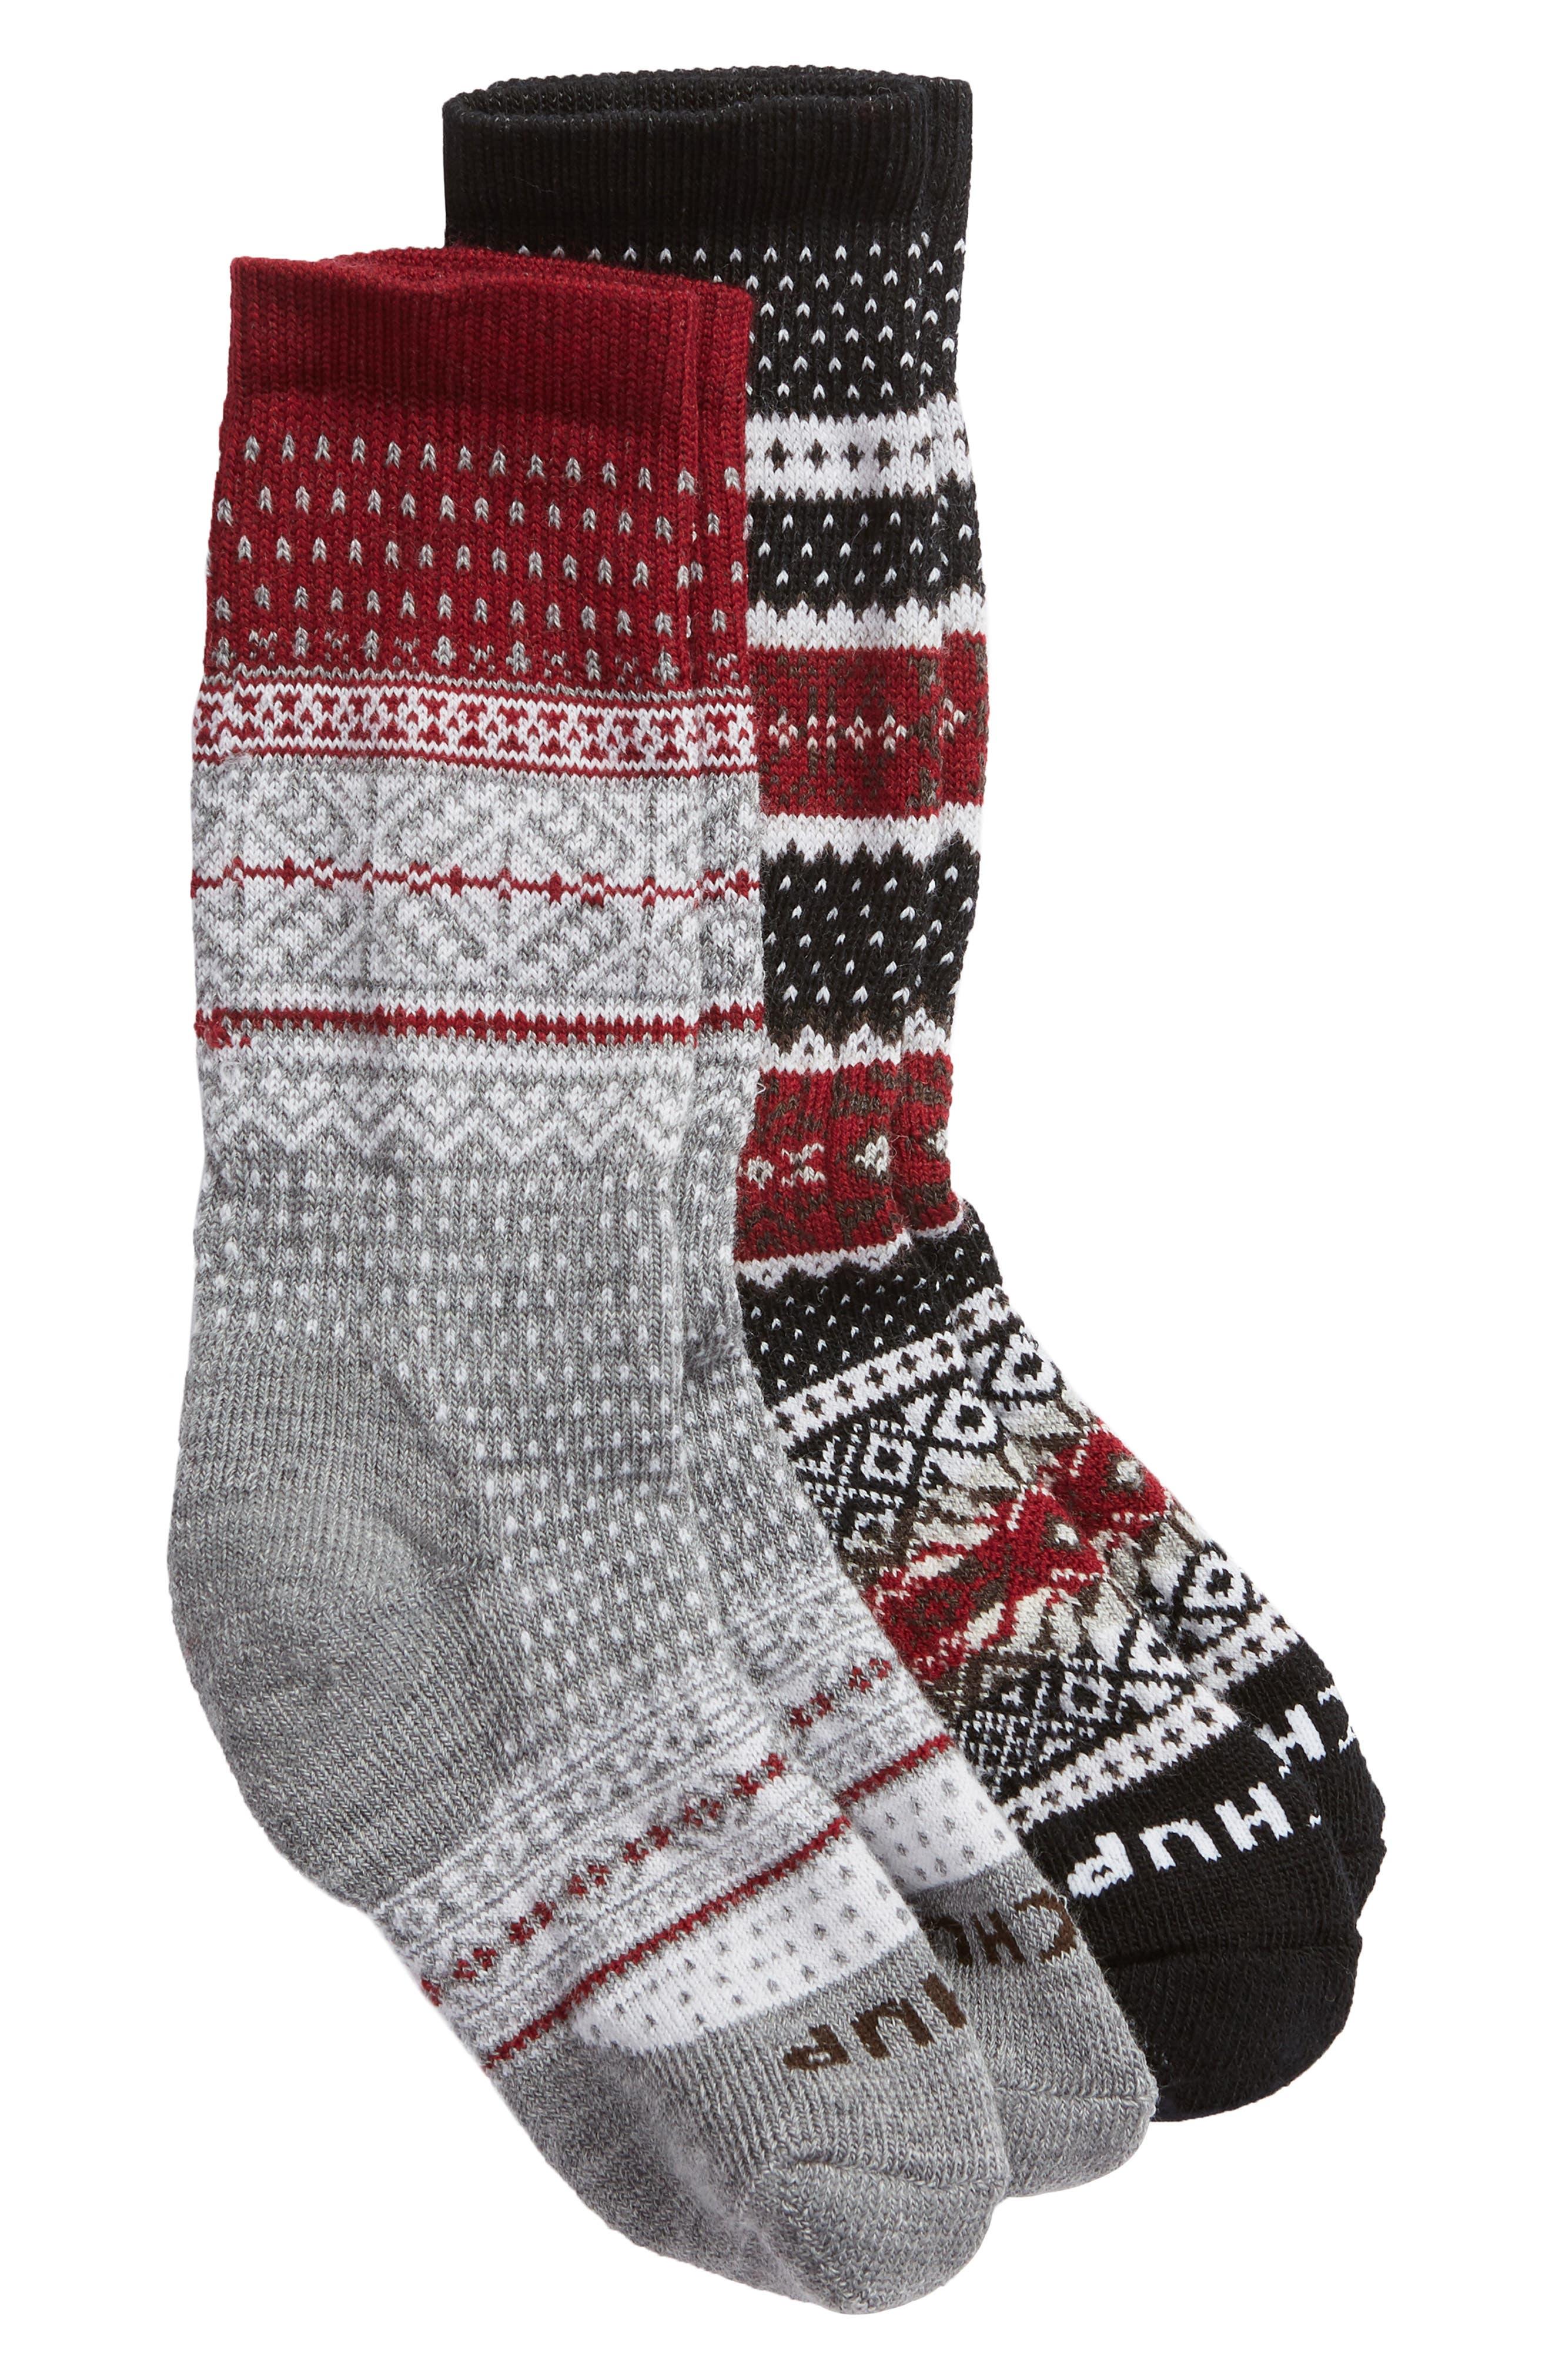 SMARTWOOL x CHUP 2-Pack Merino Wool Socks, Main, color, 019